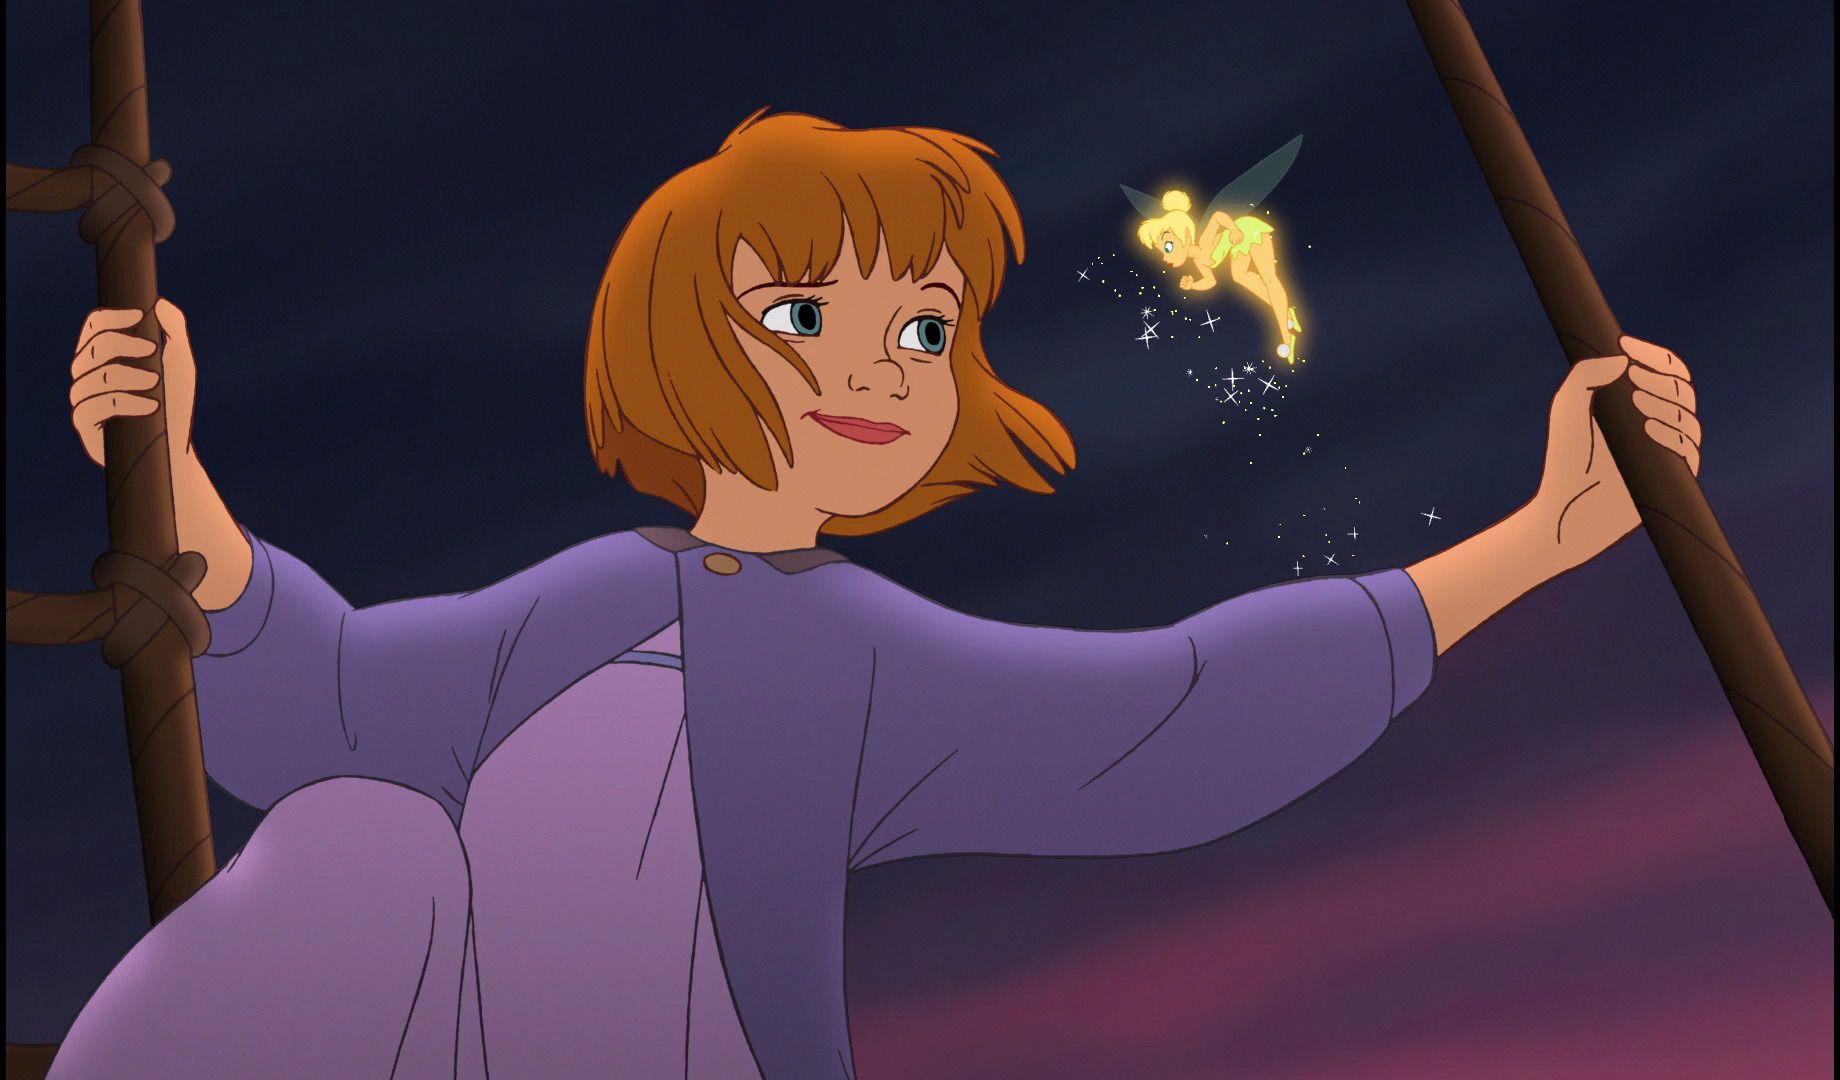 Jane Peter Pan Peter Pan Disney Jane Peter Pan Disney